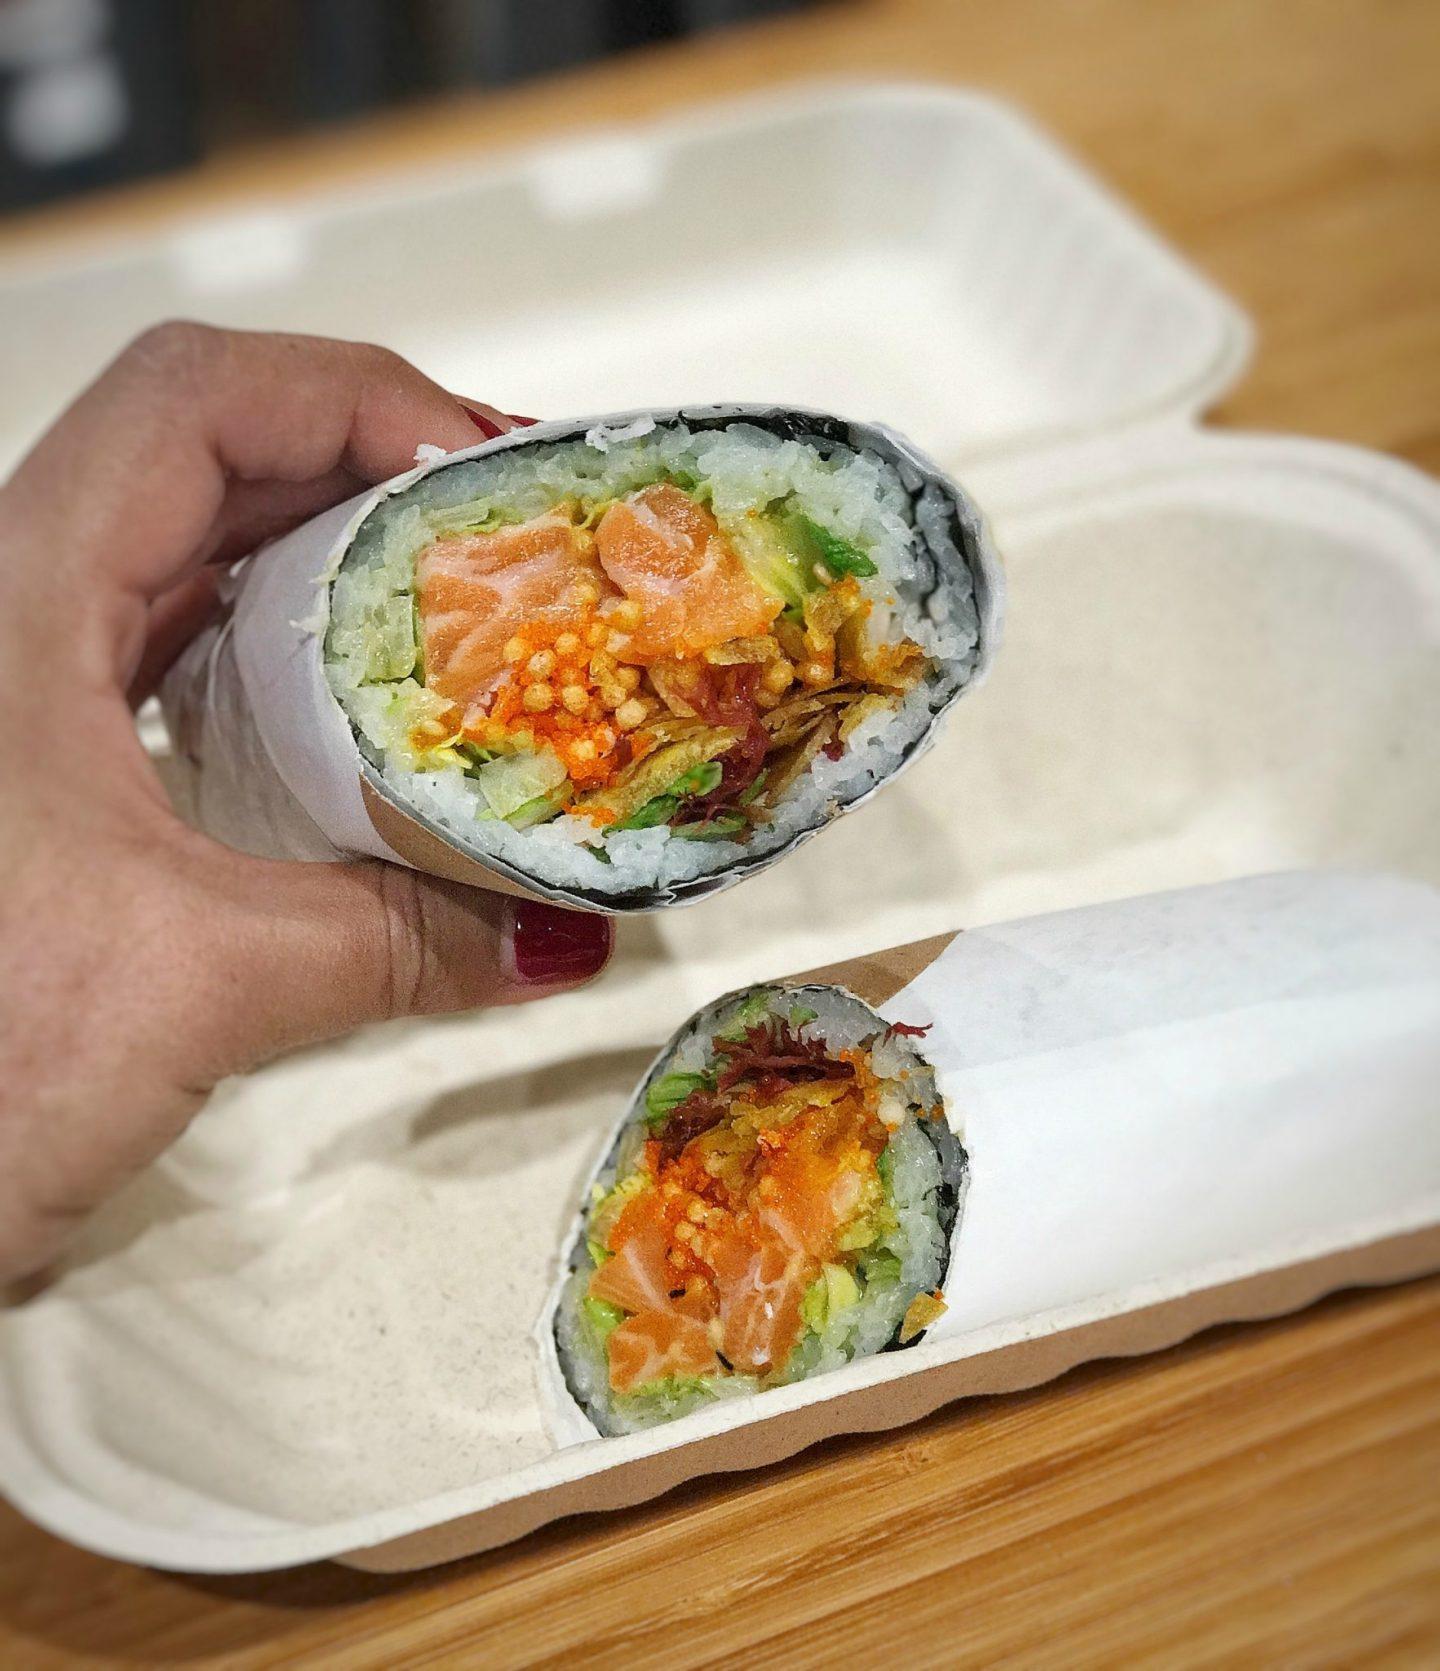 Review of Sushirrito NYC – A sushi burrito concept